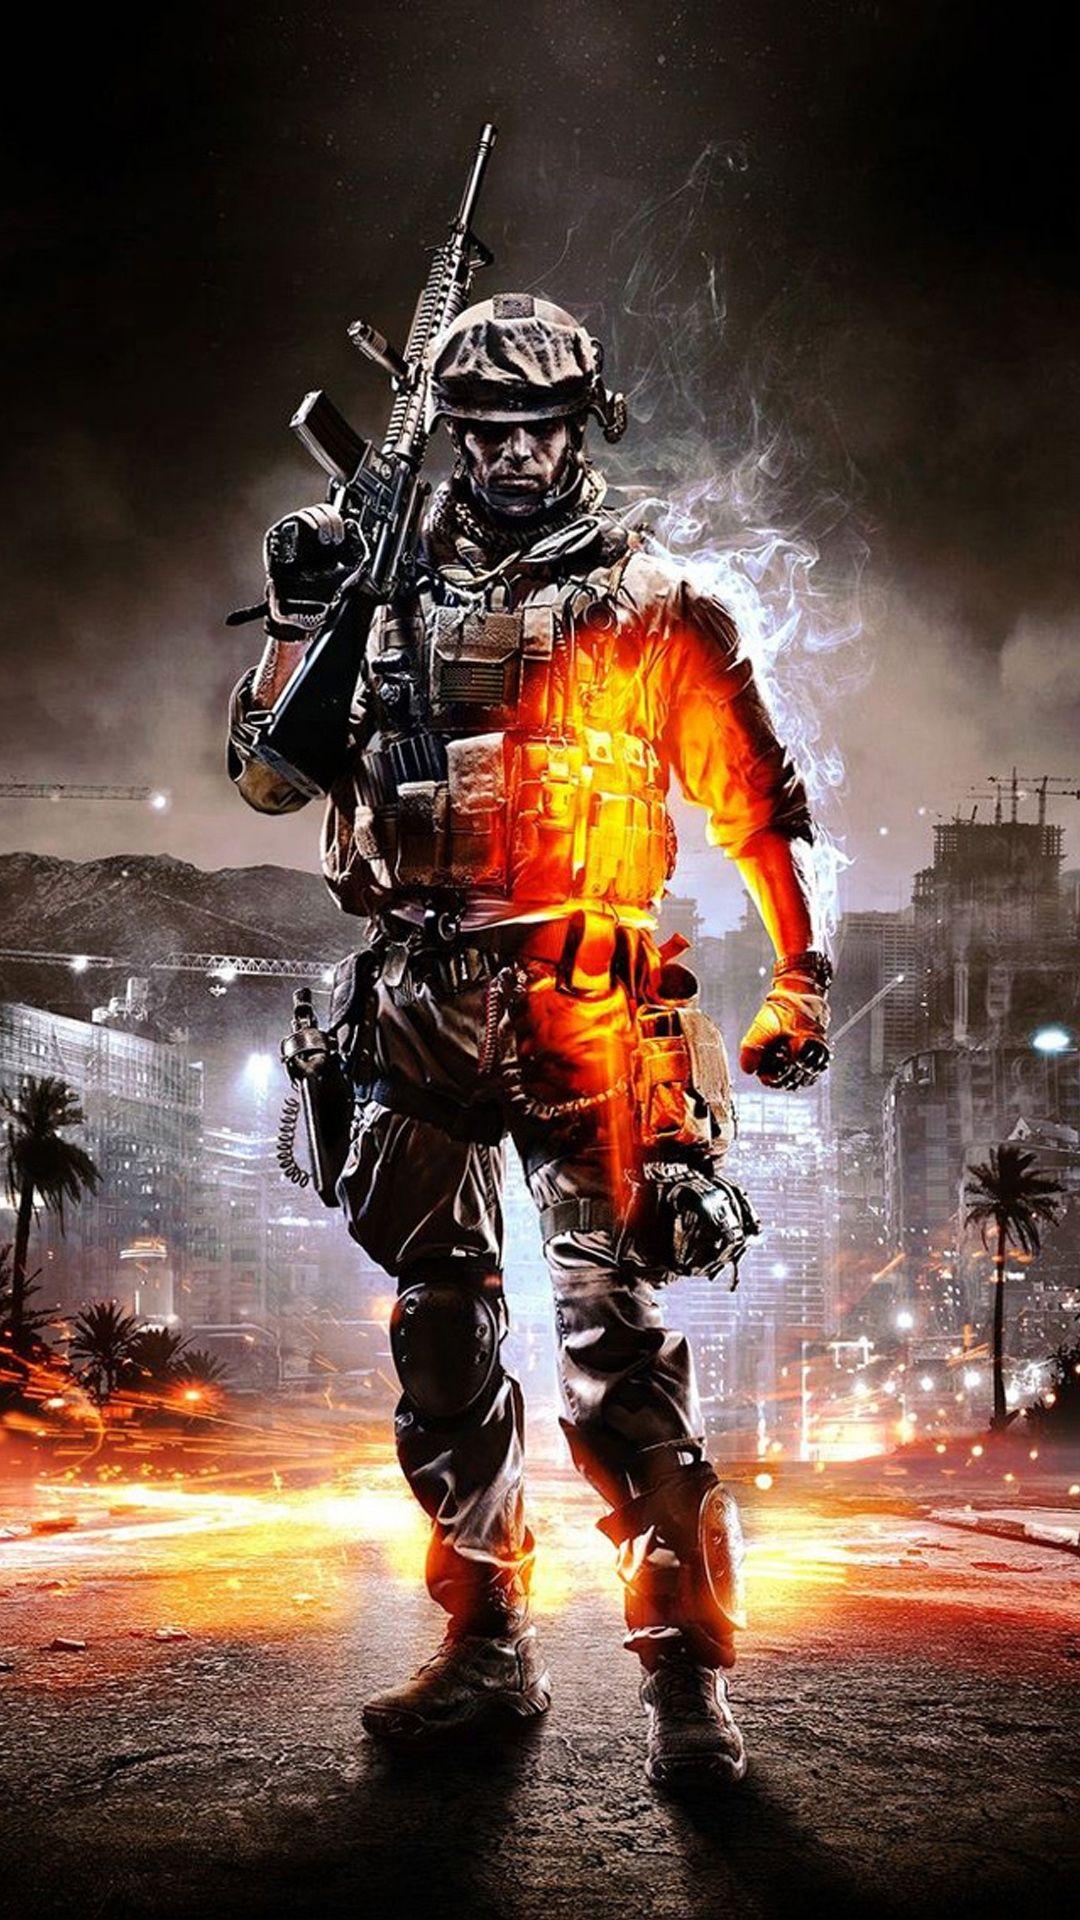 Battlefield 3 Iphone Wallpaper Papel de parede do